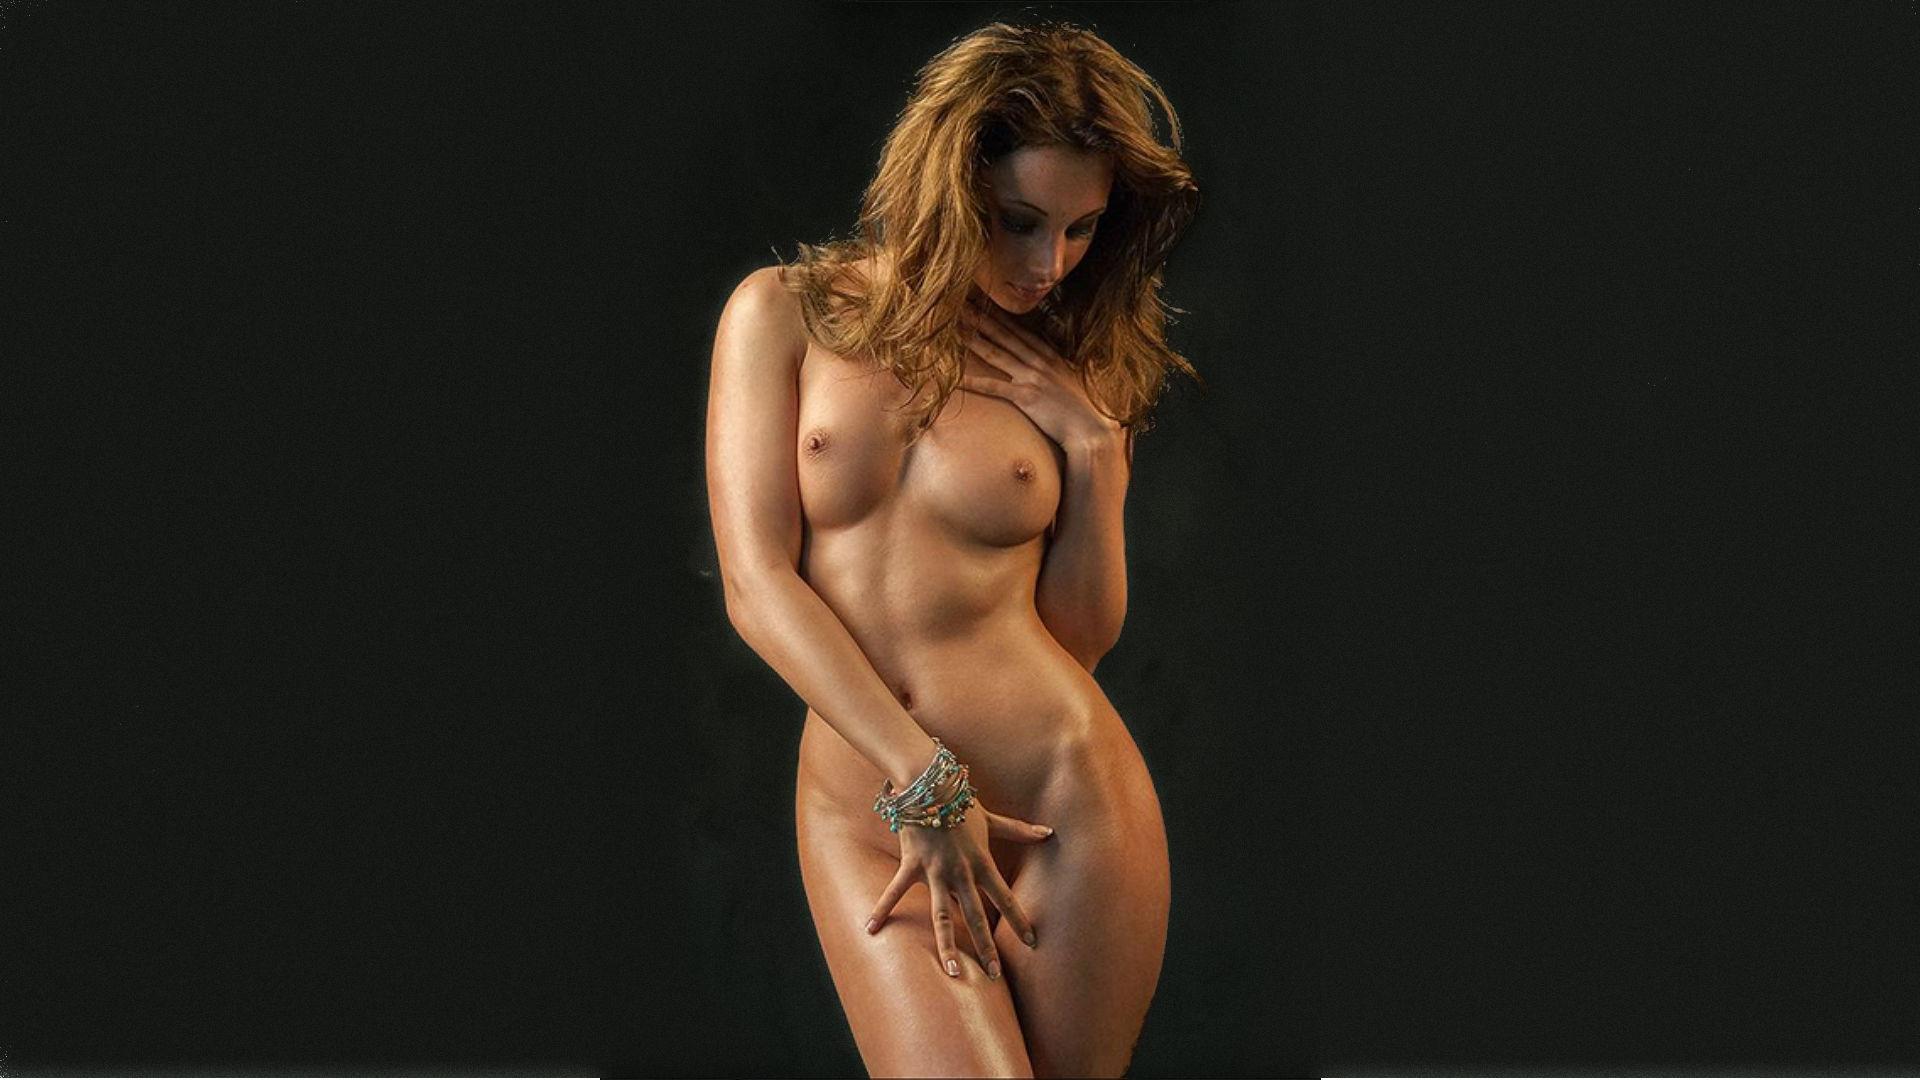 golie-tela-na-plyazhah-kieva